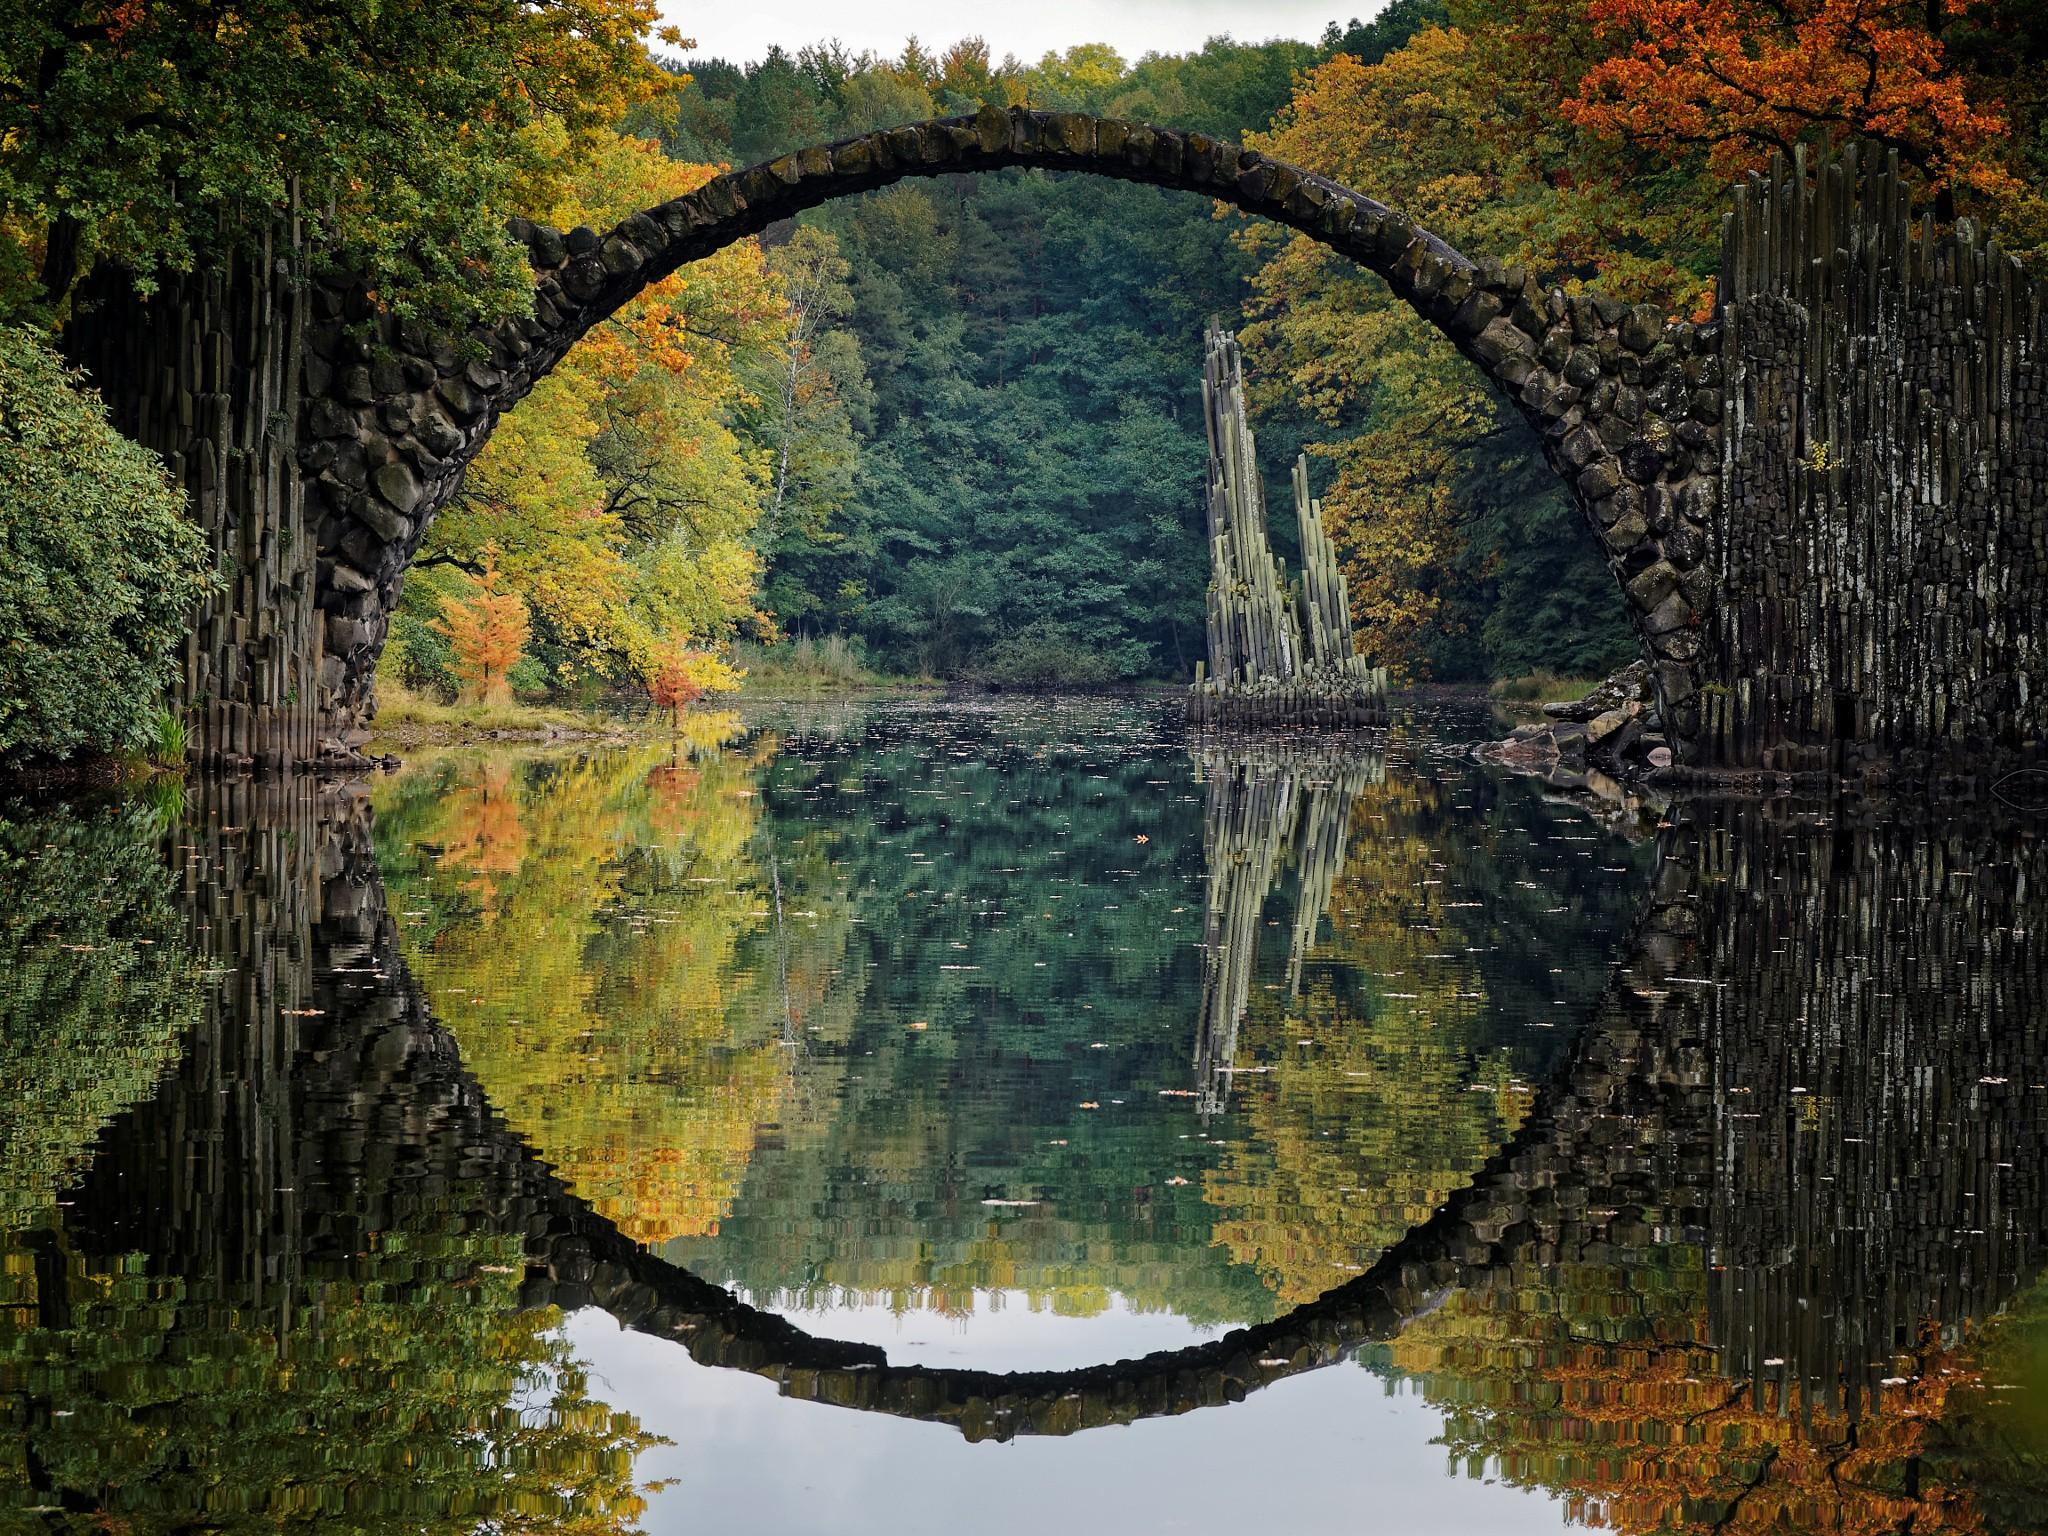 General 2048x1536 bridge river reflection fall landscape colorful Germany Rakotzbrücke Devil's Bridge, Germany